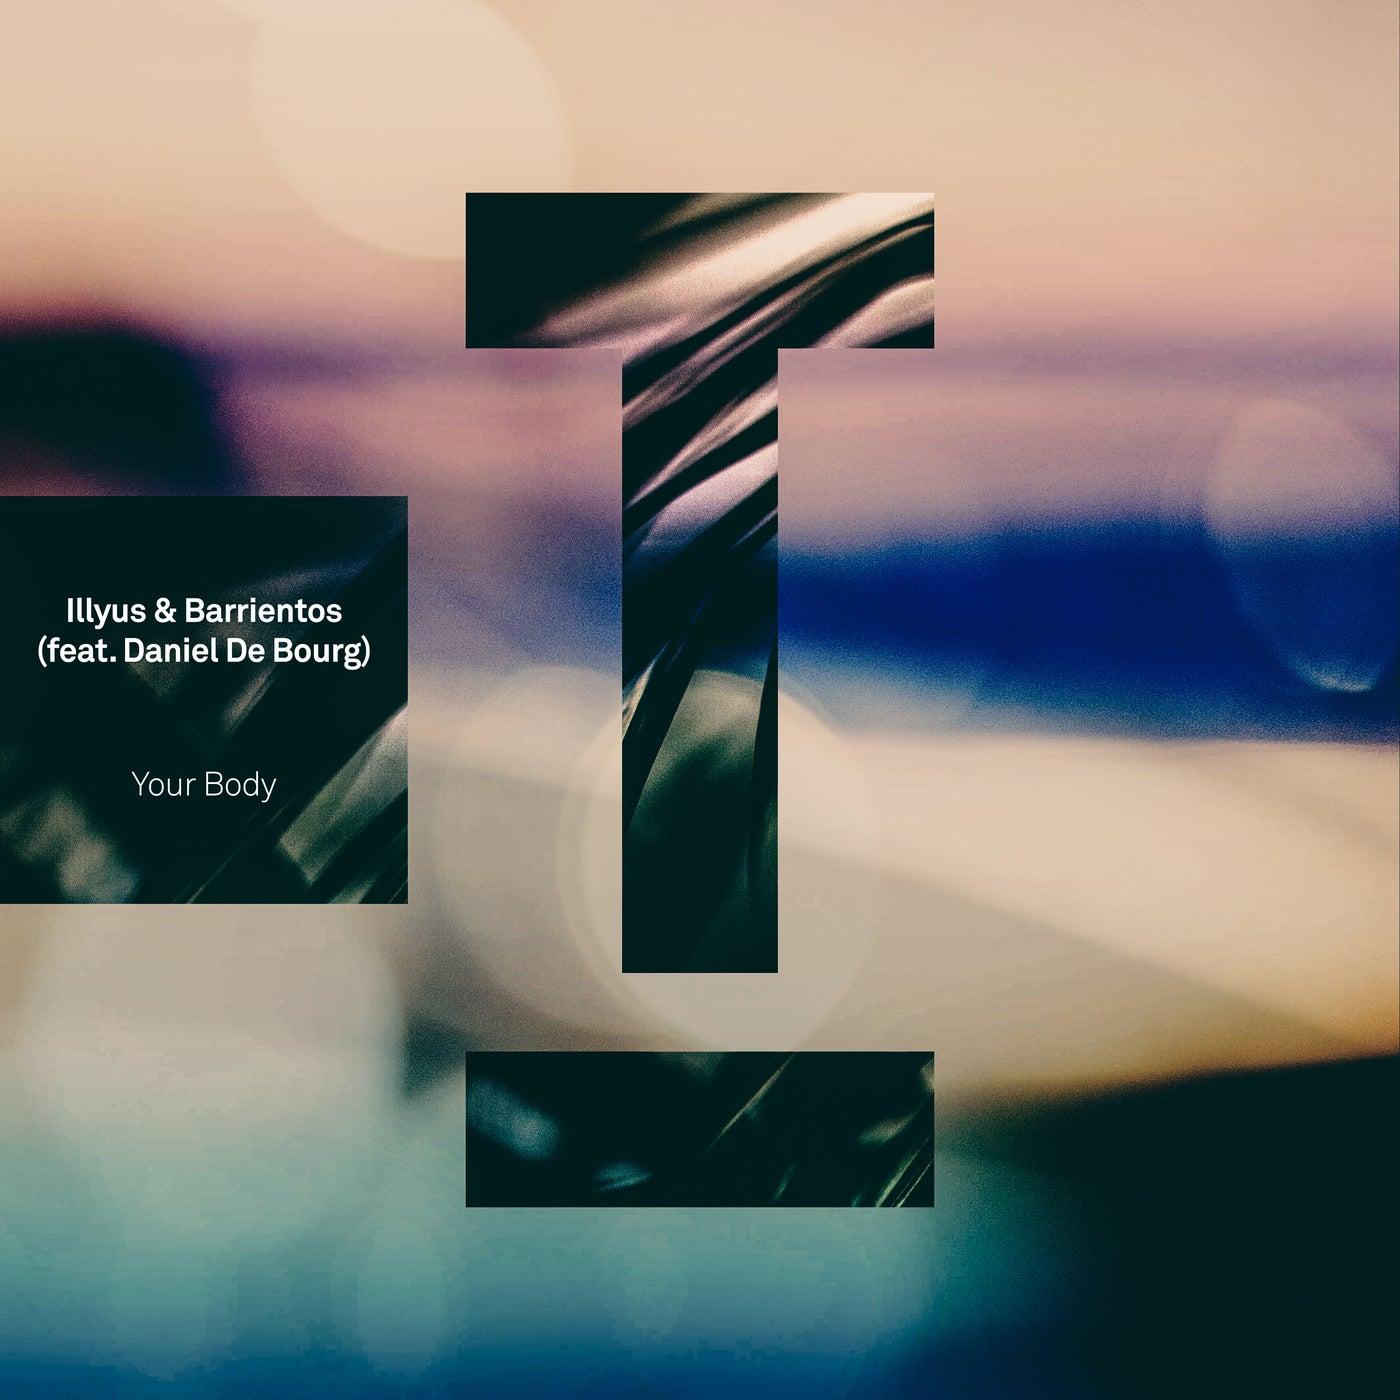 Your Body feat. Daniel De Bourg (Extended Mix)